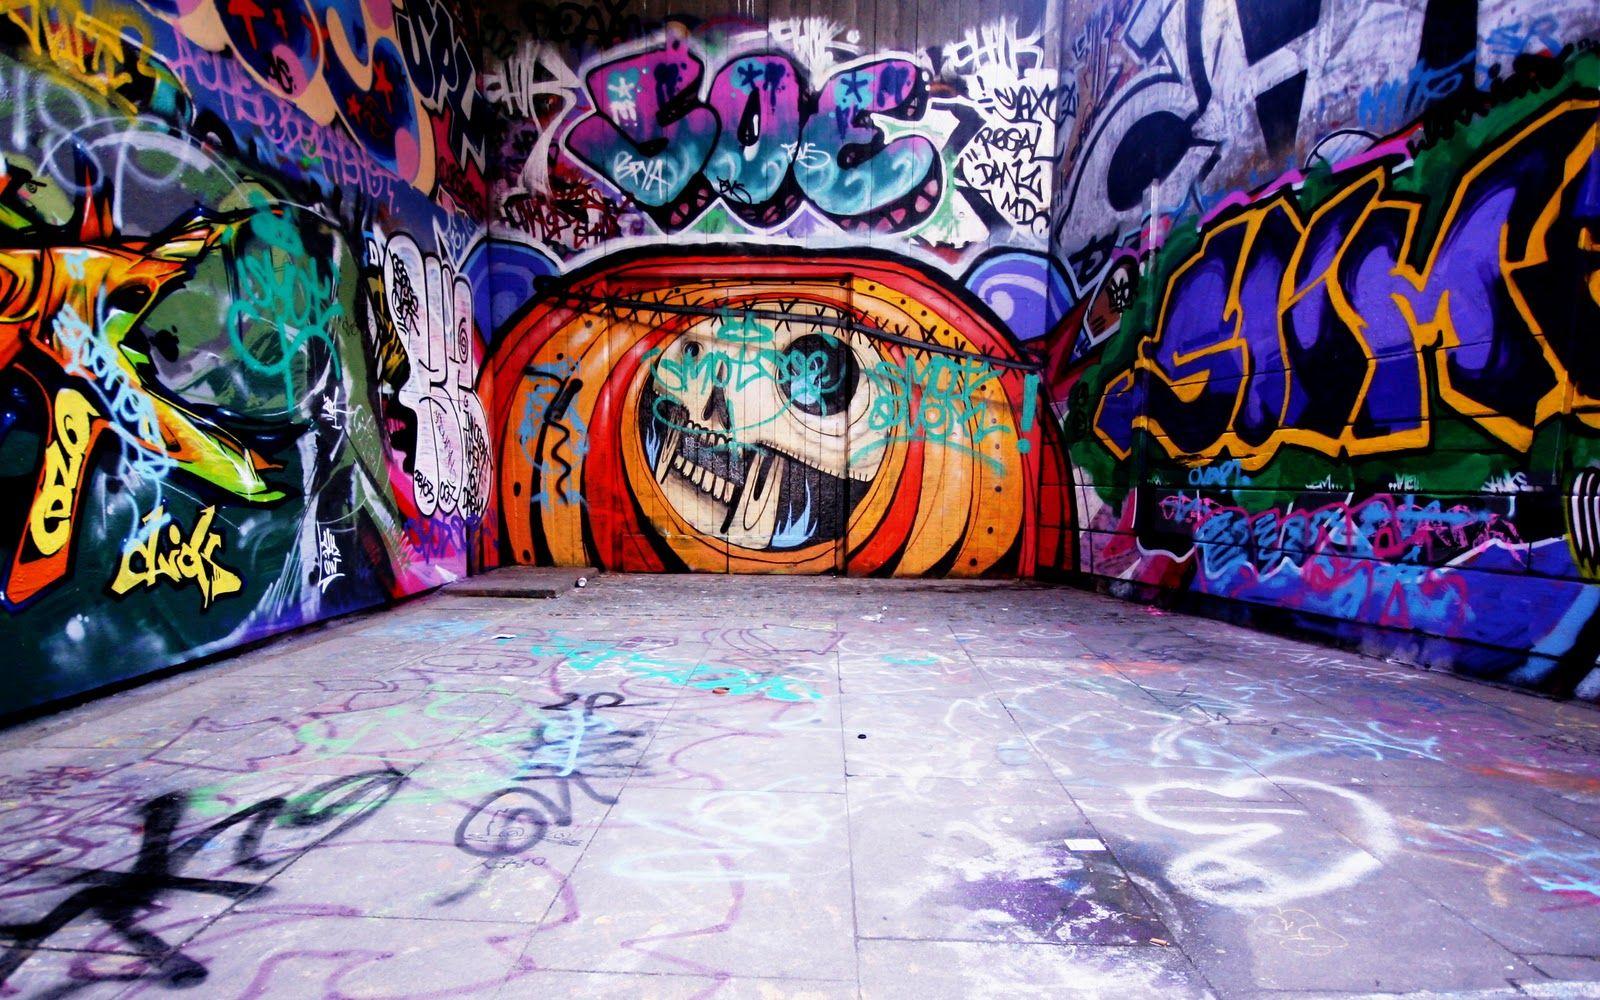 Graffiti art wallpaper for walls - Graffiti Room Wallpaper Hd Wallpaper High Quality Backgrounds For Mobile Iphone Desktop